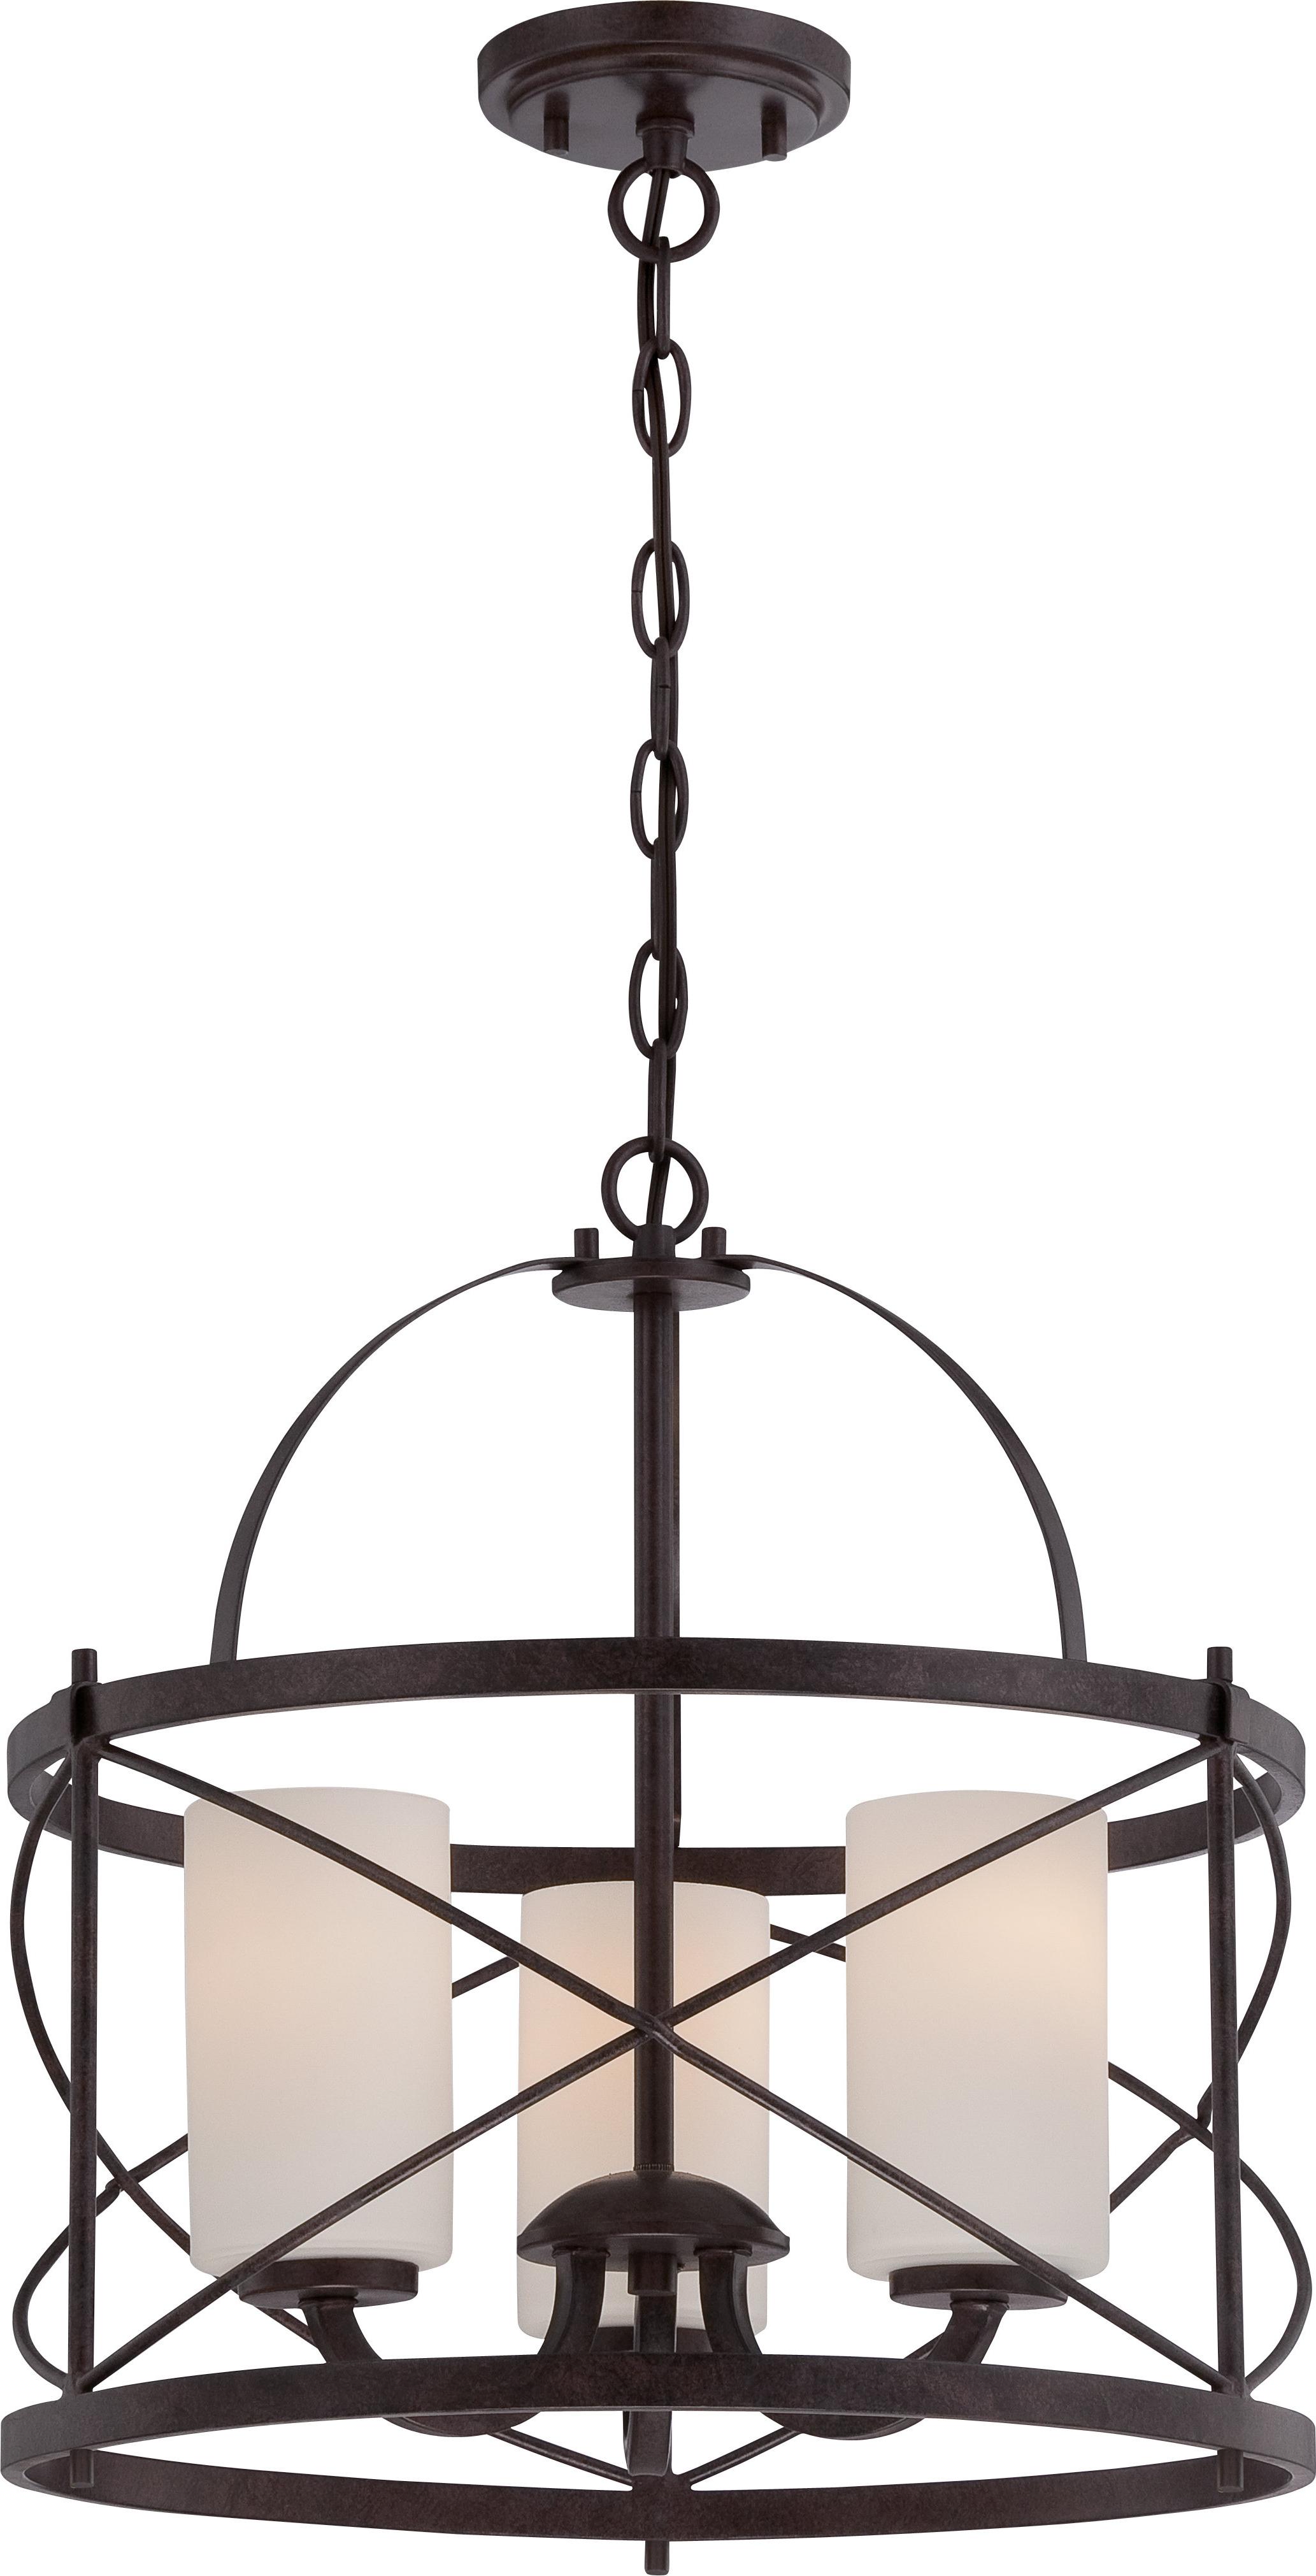 Armande 4 Light Lantern Drum Pendants Regarding Well Liked Farrier 3 Light Lantern Drum Pendant (View 5 of 25)